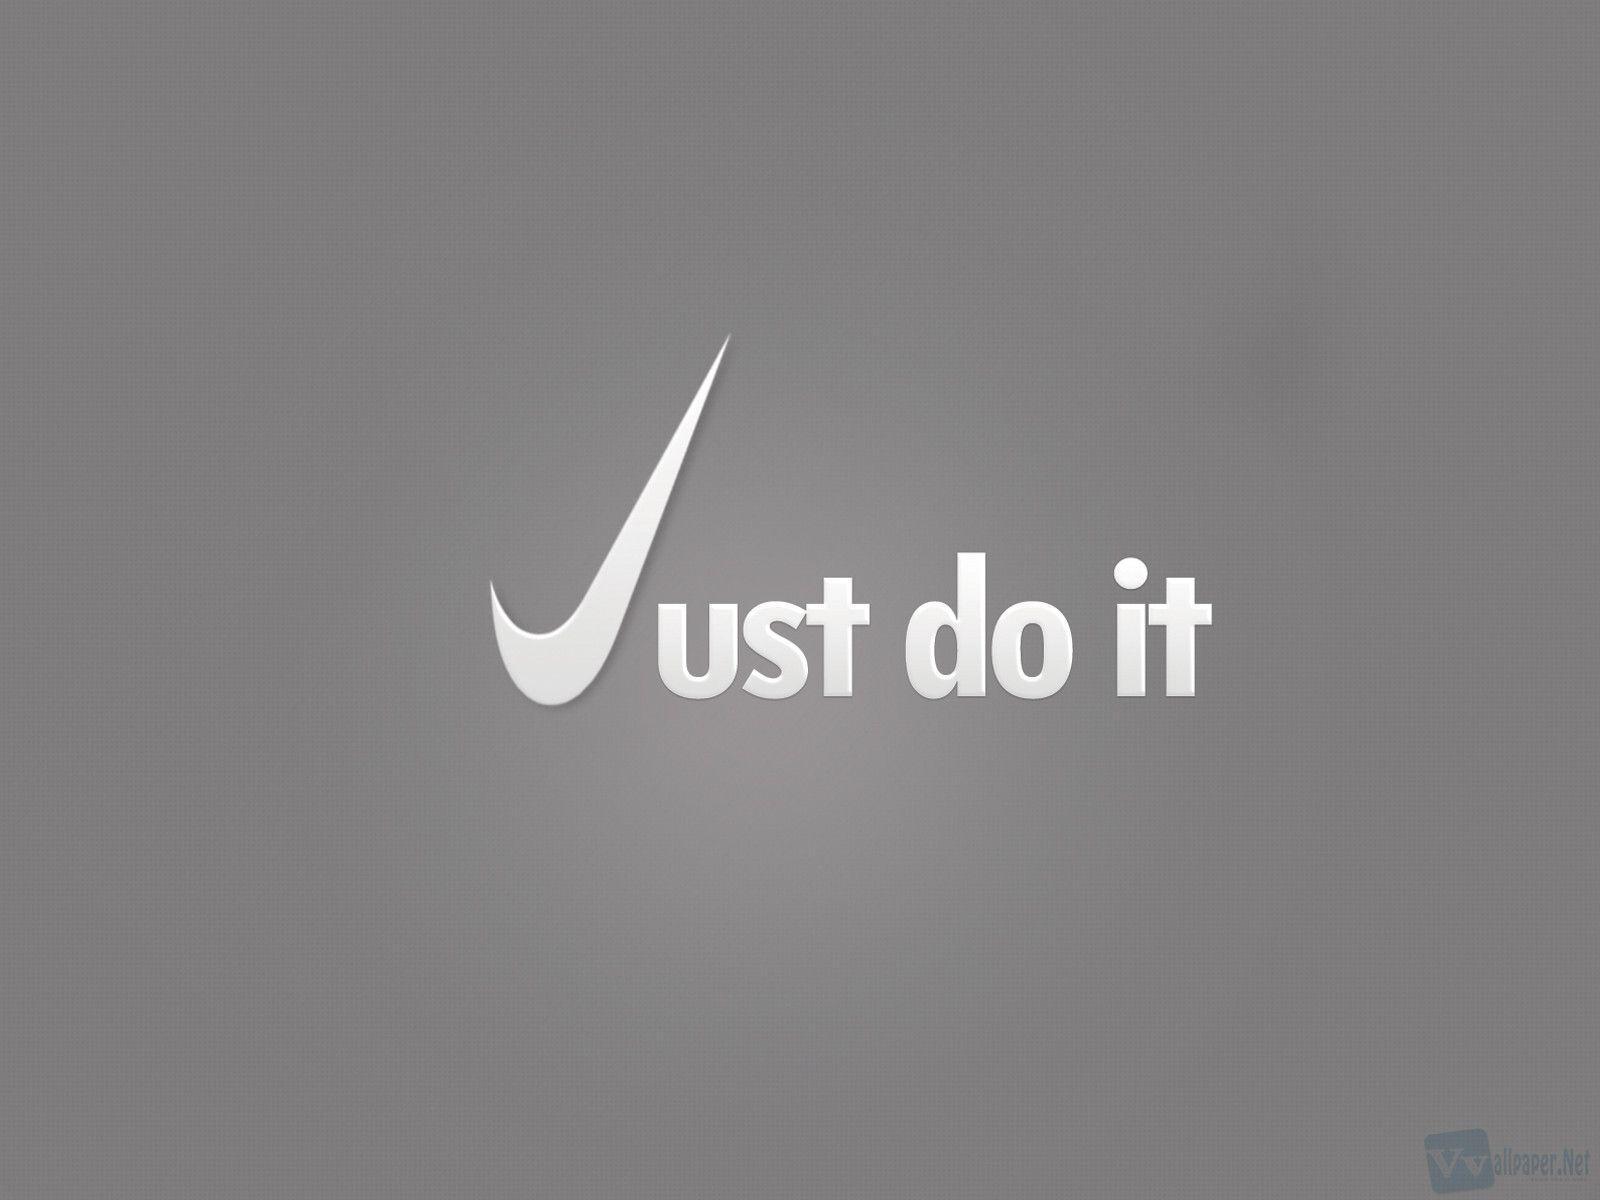 Nike Wallpaper on WallpaperSafari